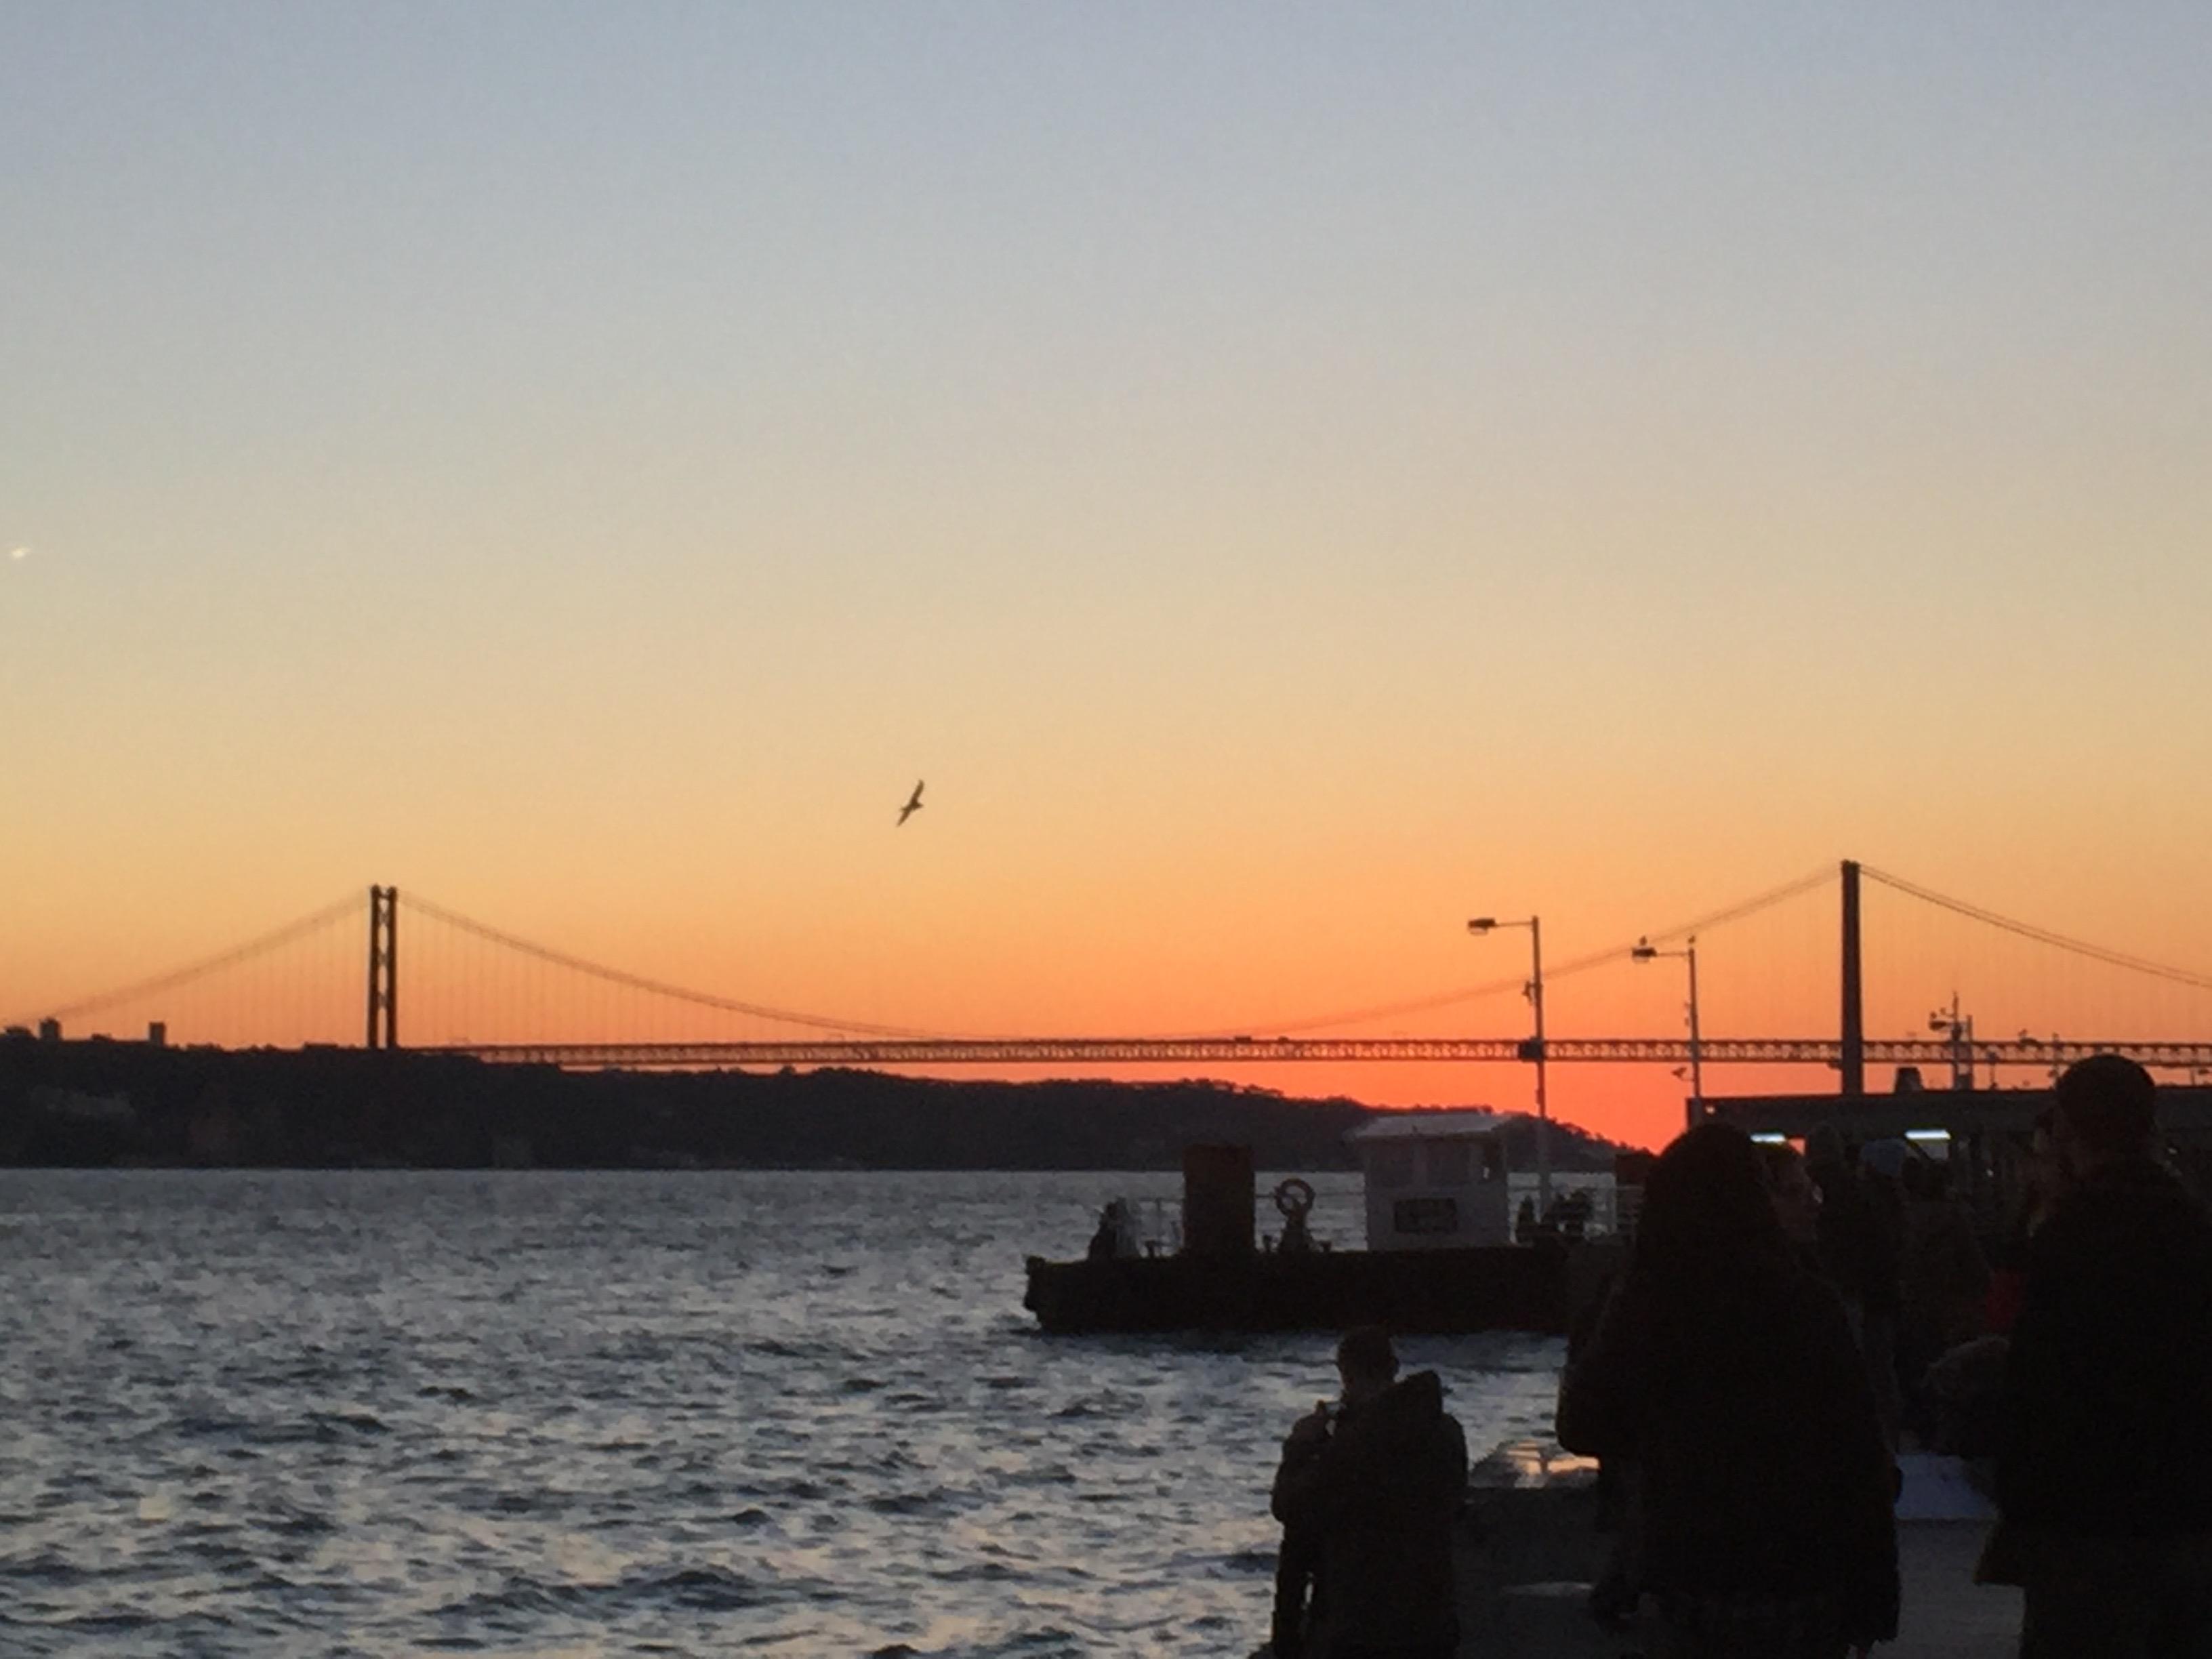 lisbon_bridge_portugal_lustforthesublime